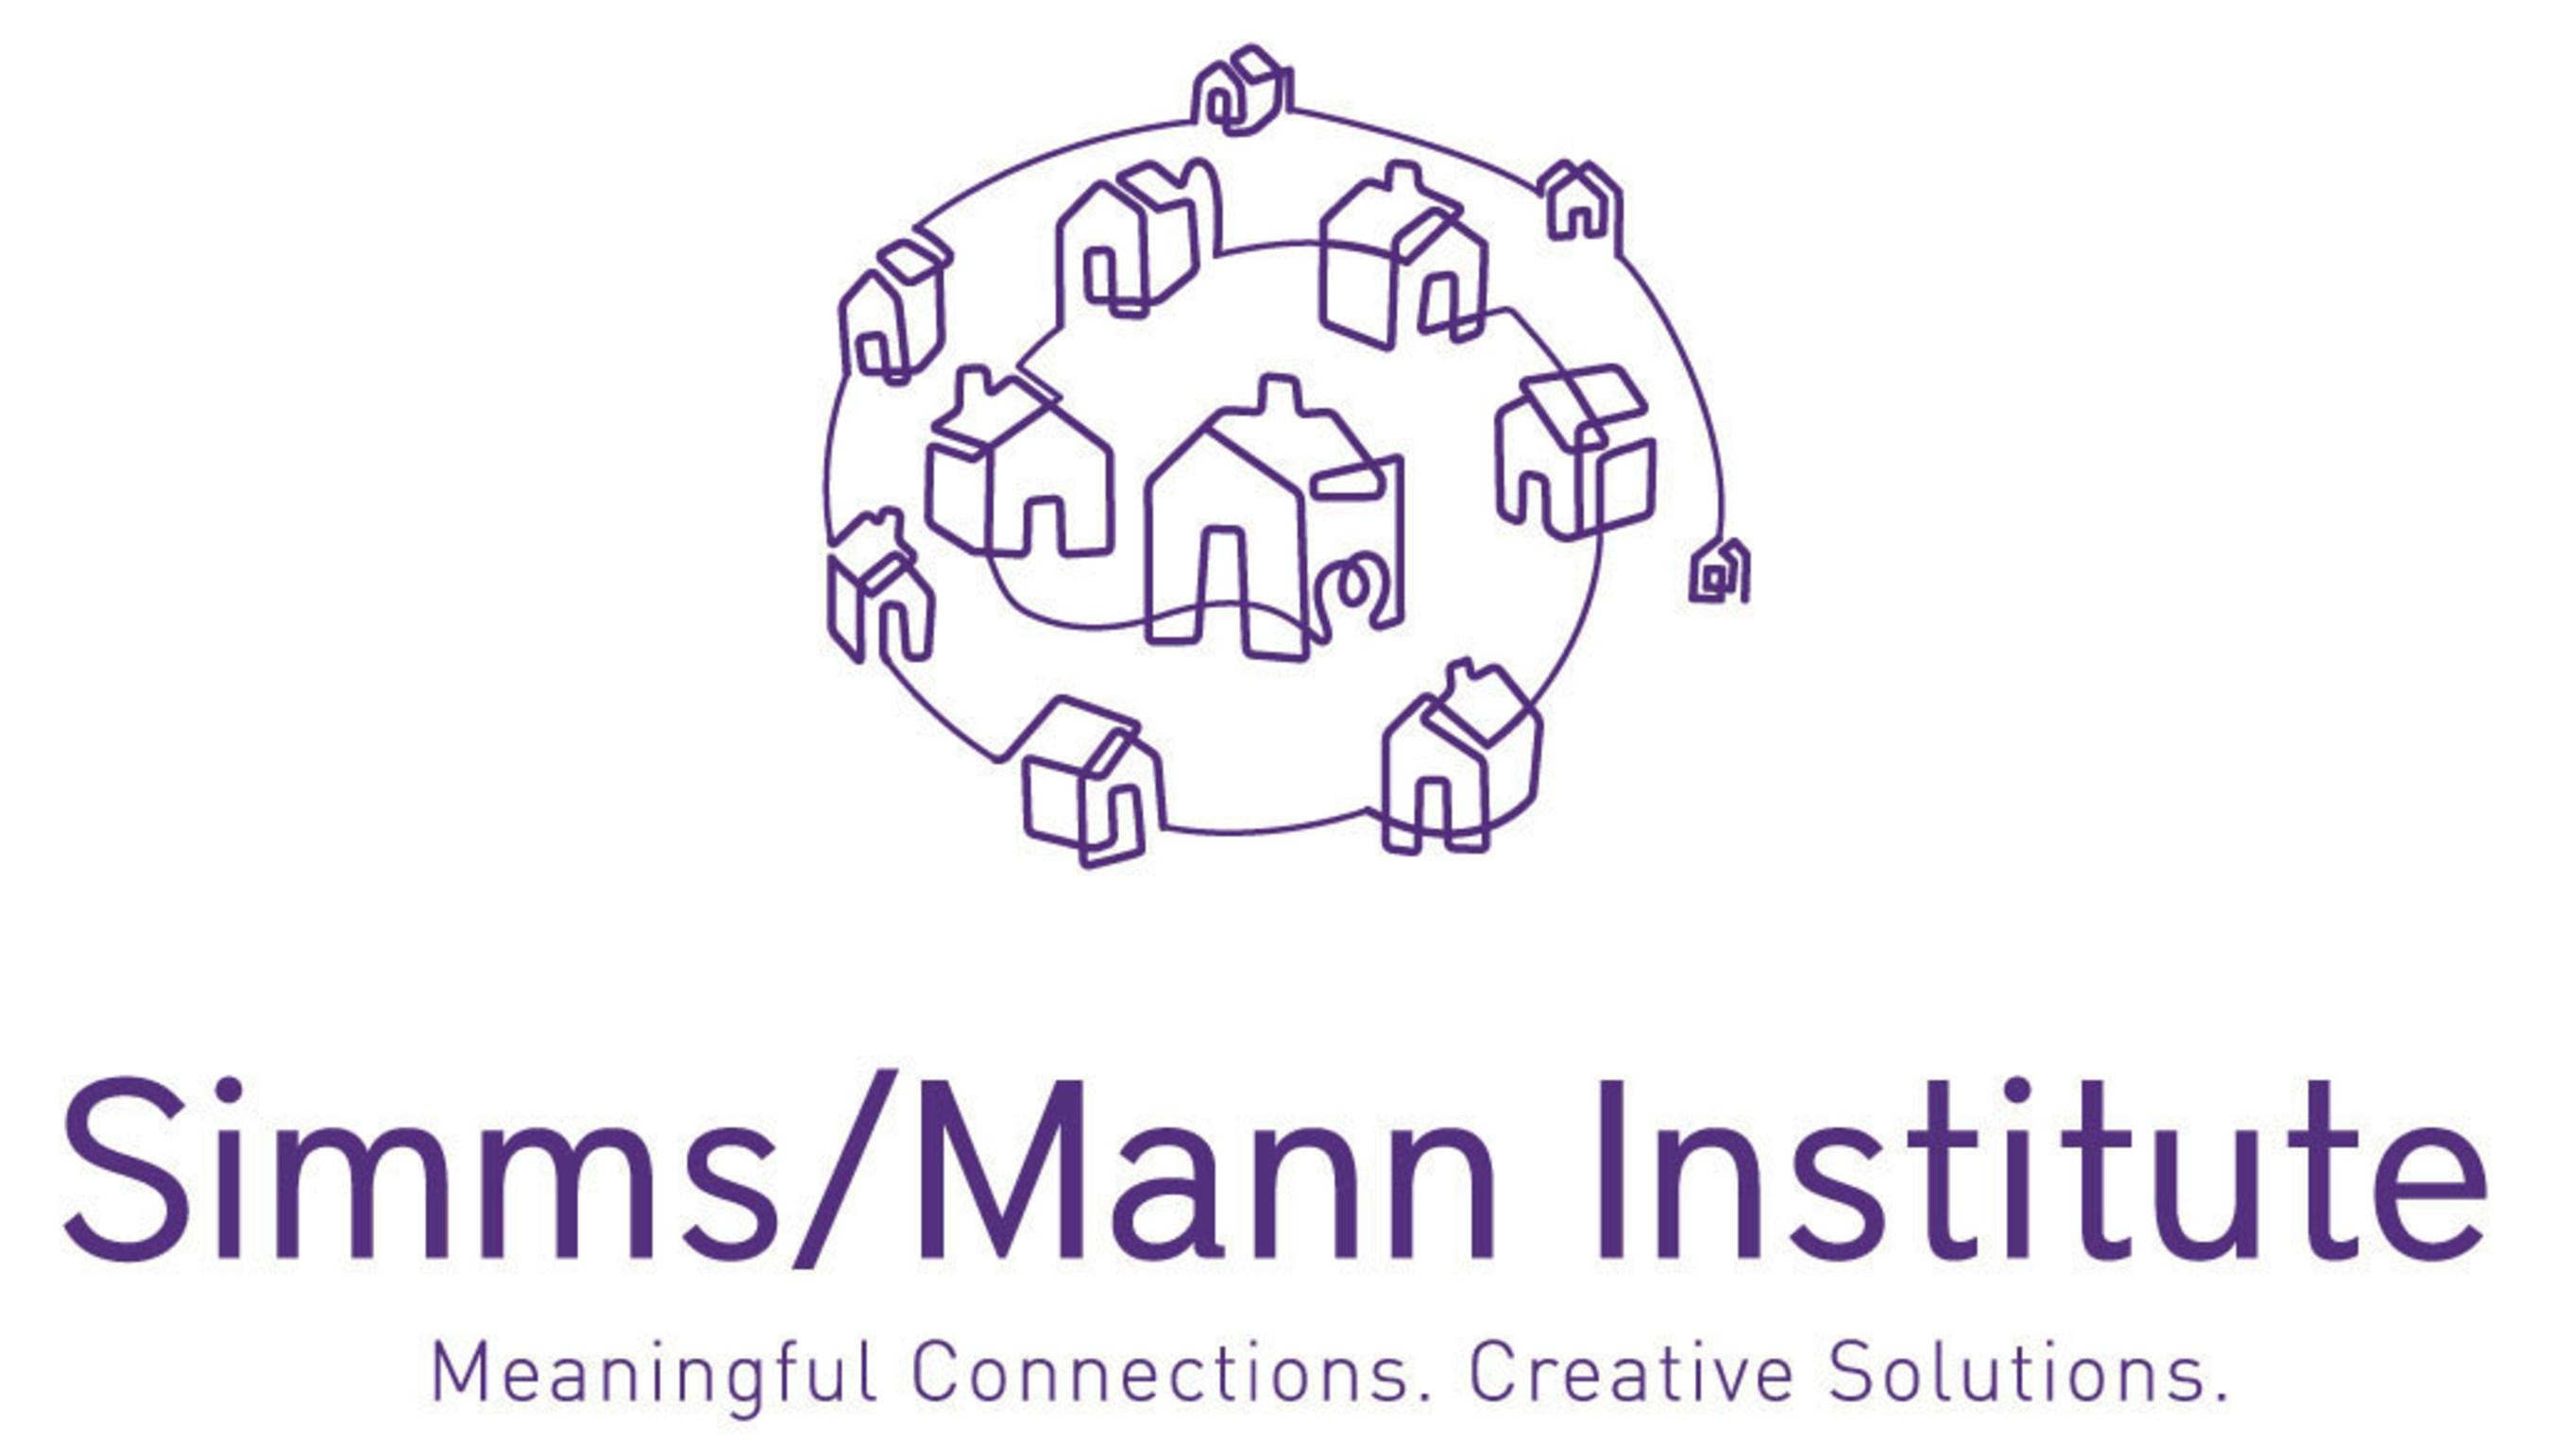 Simms/Mann Institute